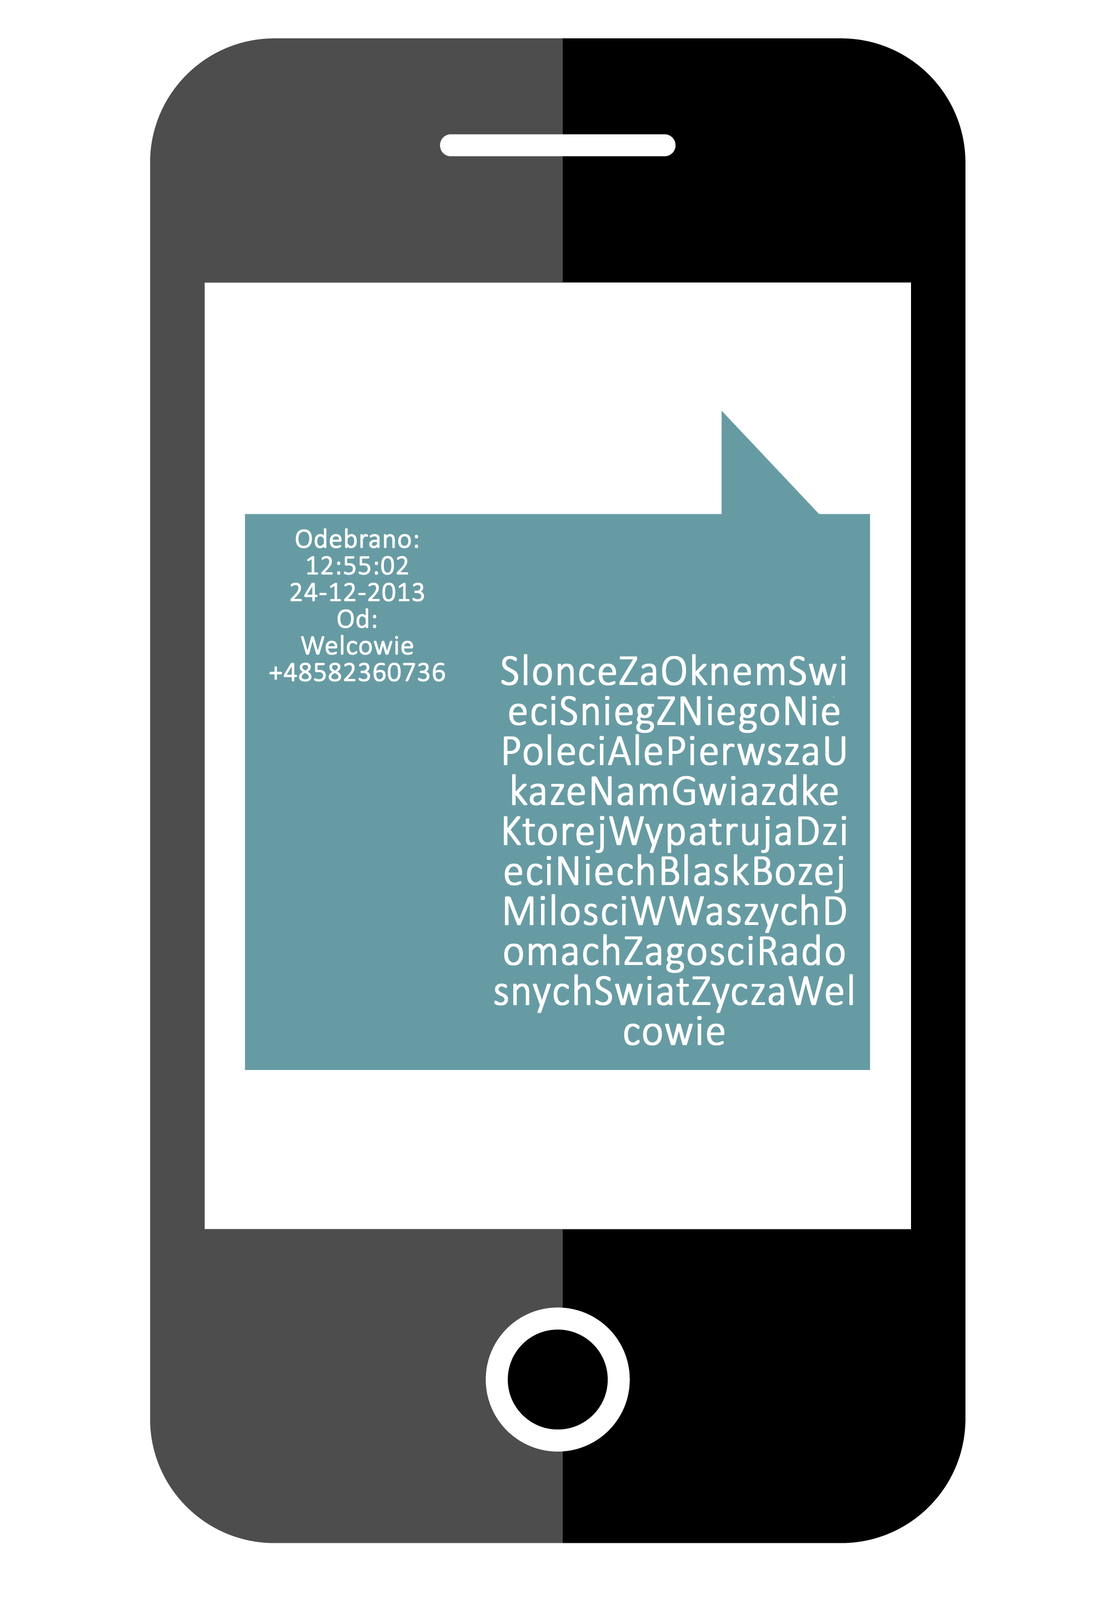 sms Źródło: Contentplus.pl sp. zo.o., licencja: CC BY-SA 4.0.